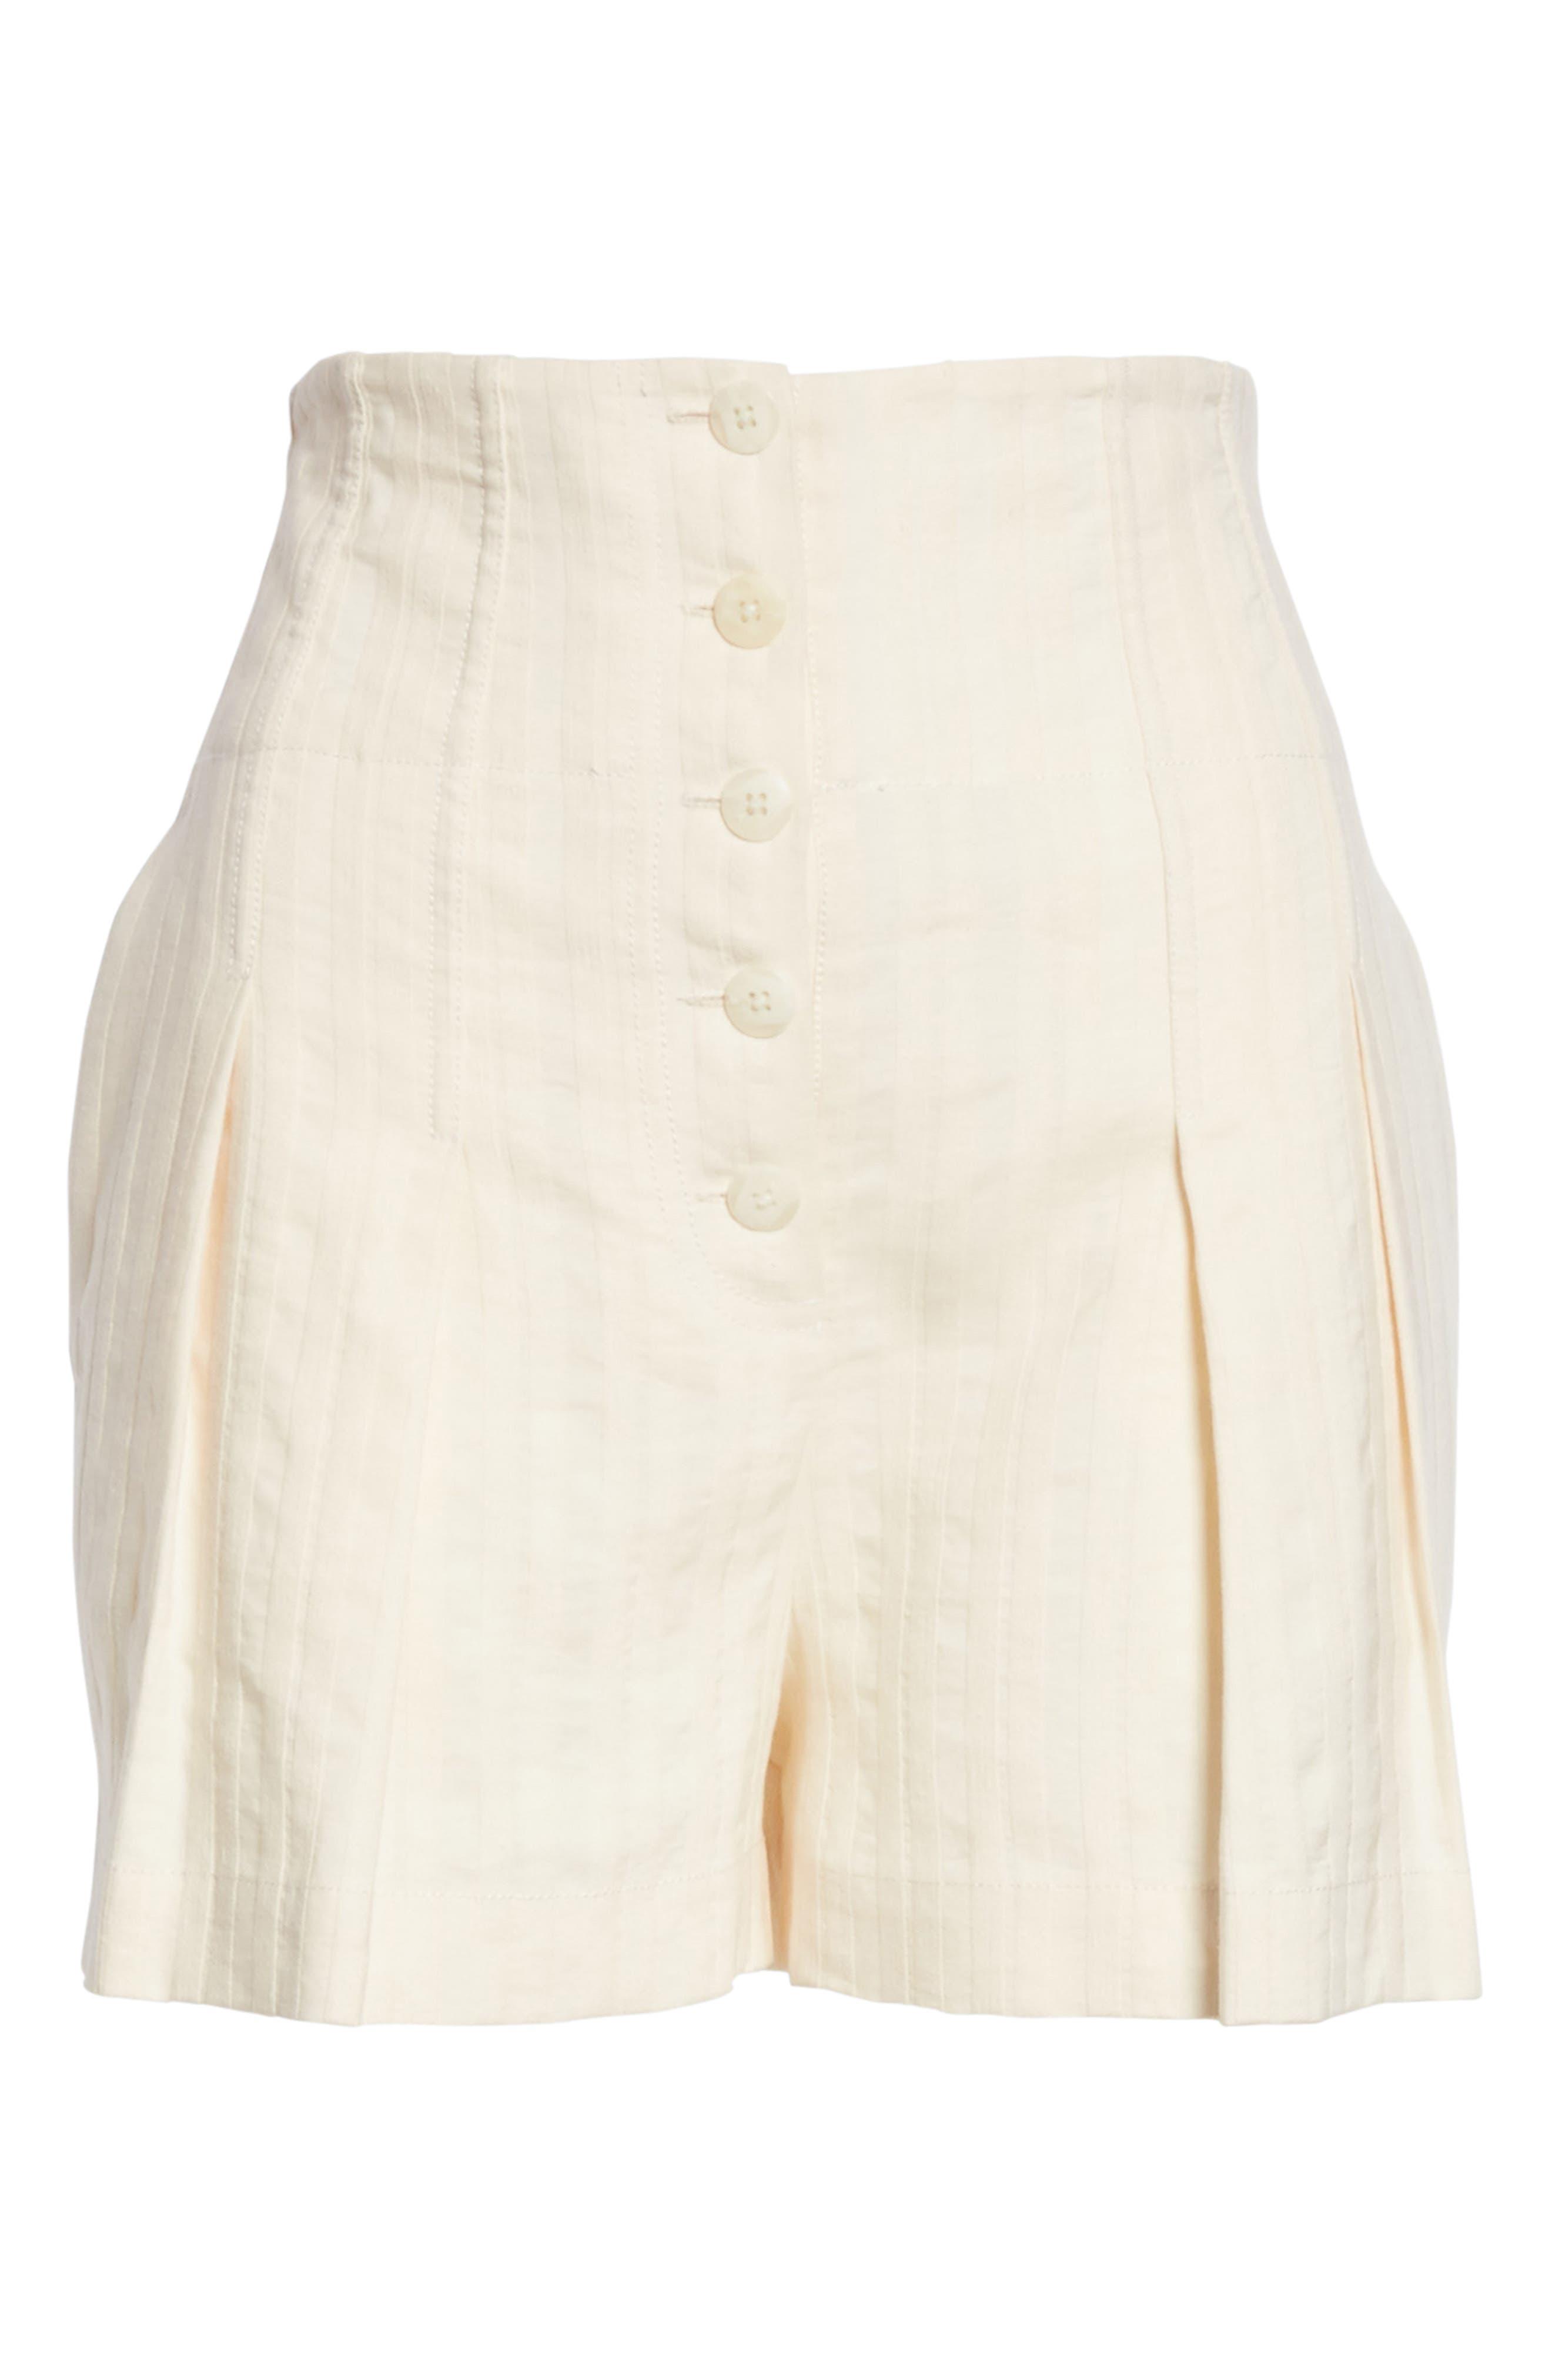 Textured Stripe Shorts,                             Alternate thumbnail 6, color,                             Creme Brulee